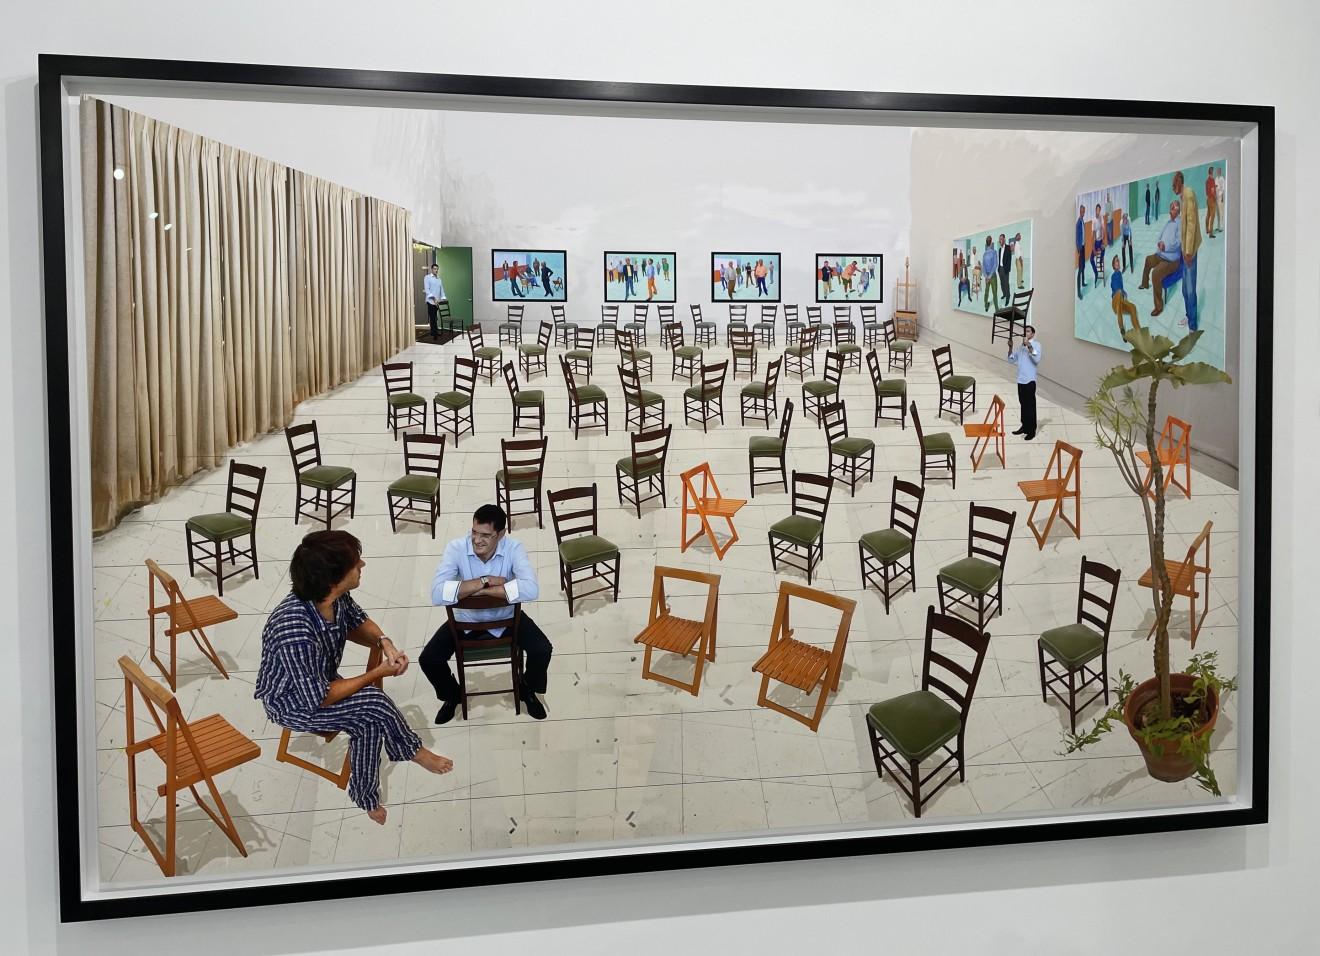 David Hockney, The Chairs, 2014